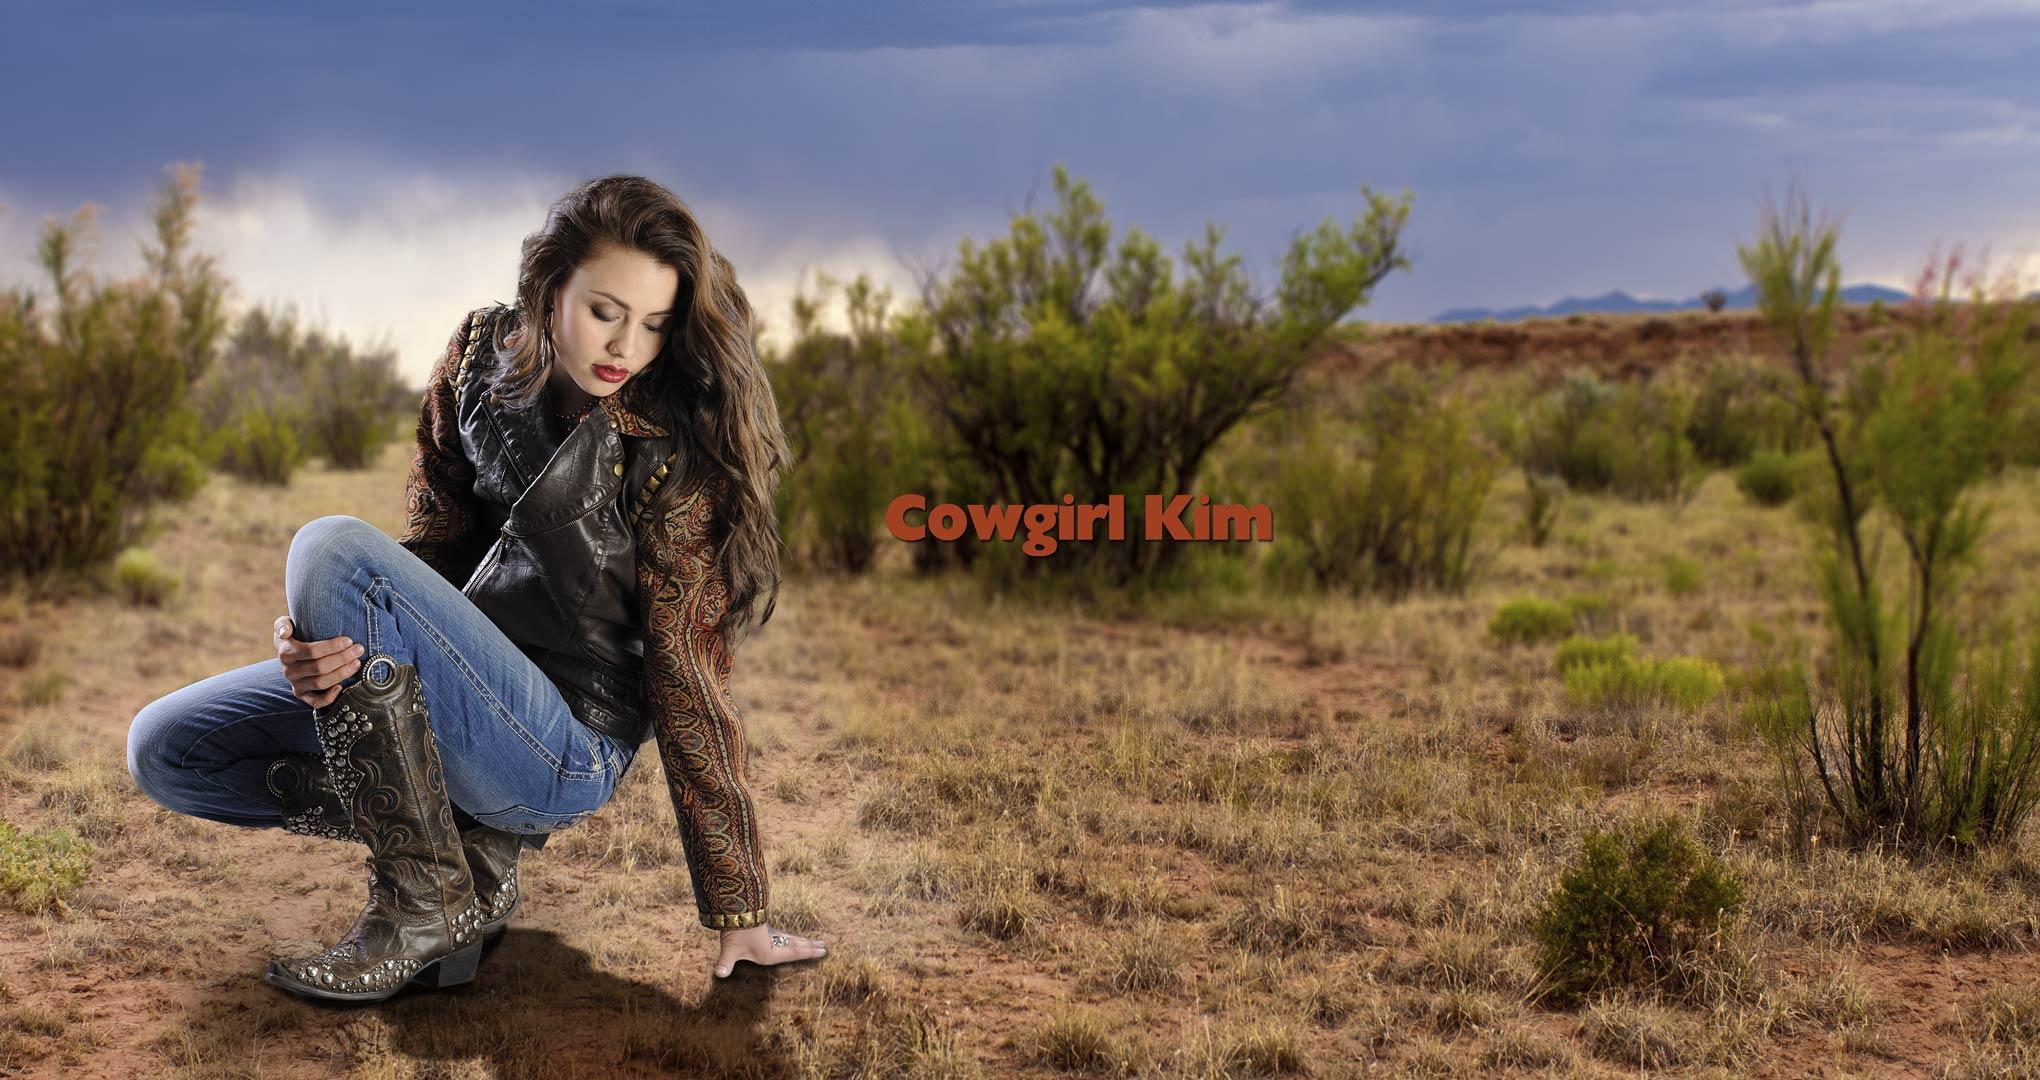 cowgirl-kim-s7